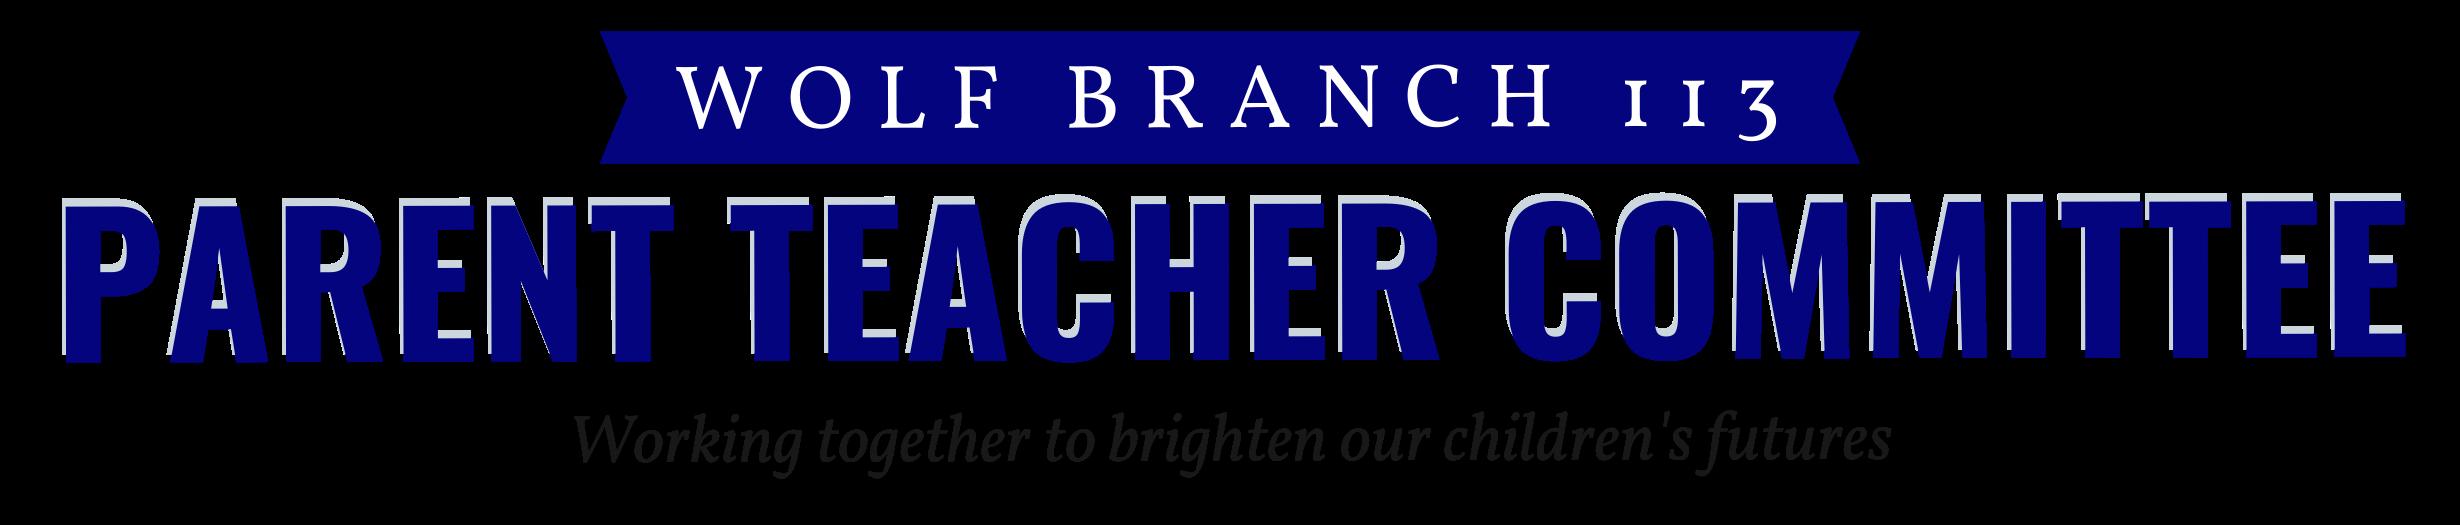 Wolf Branch PTC: Working together to brighten our children's futures